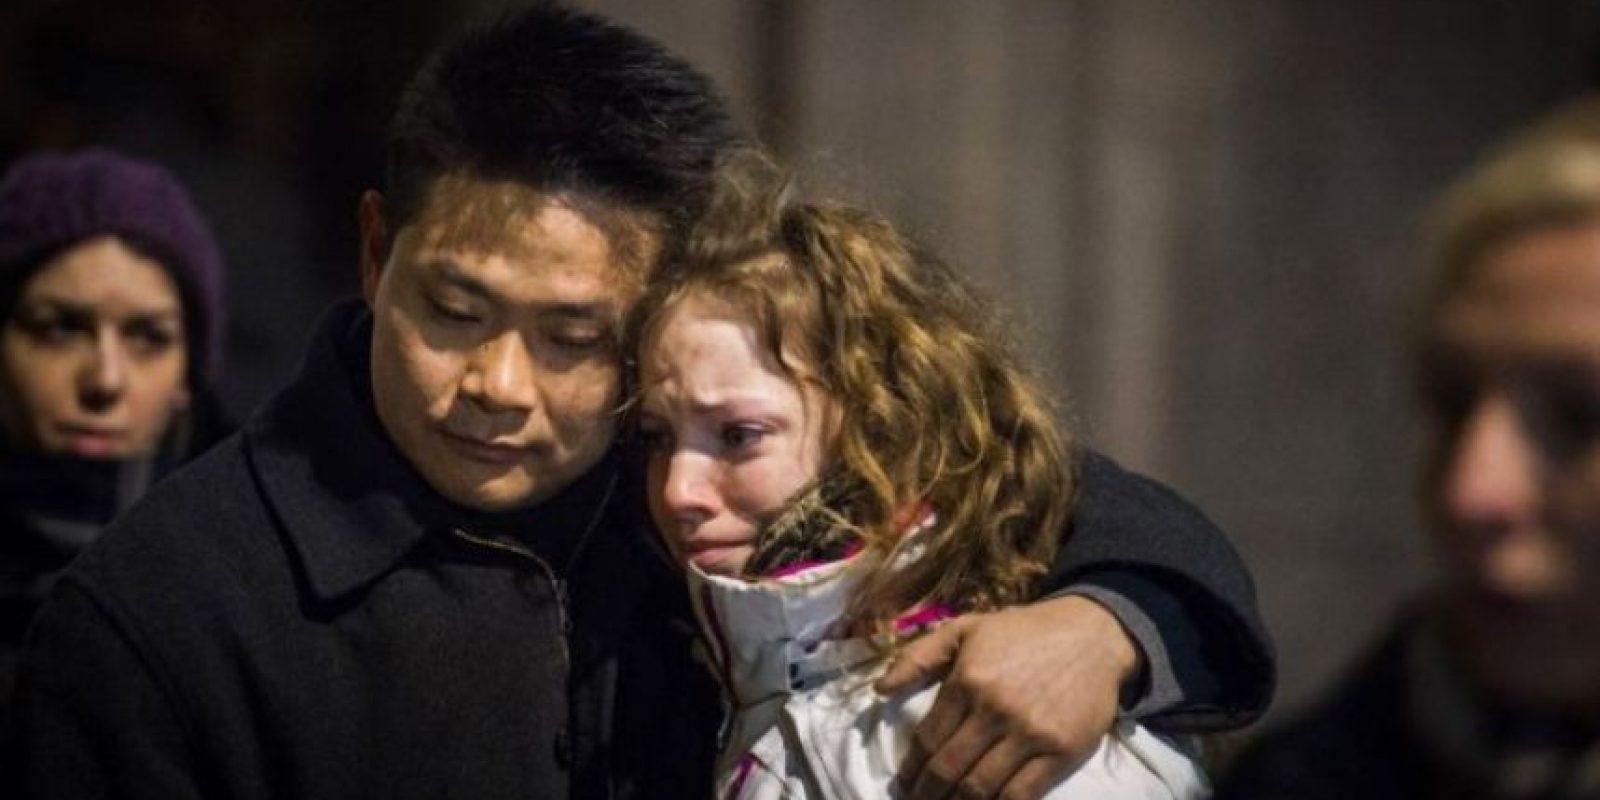 14 de febrero- Ataque en Copenhague, Dinamarca Foto:AFP